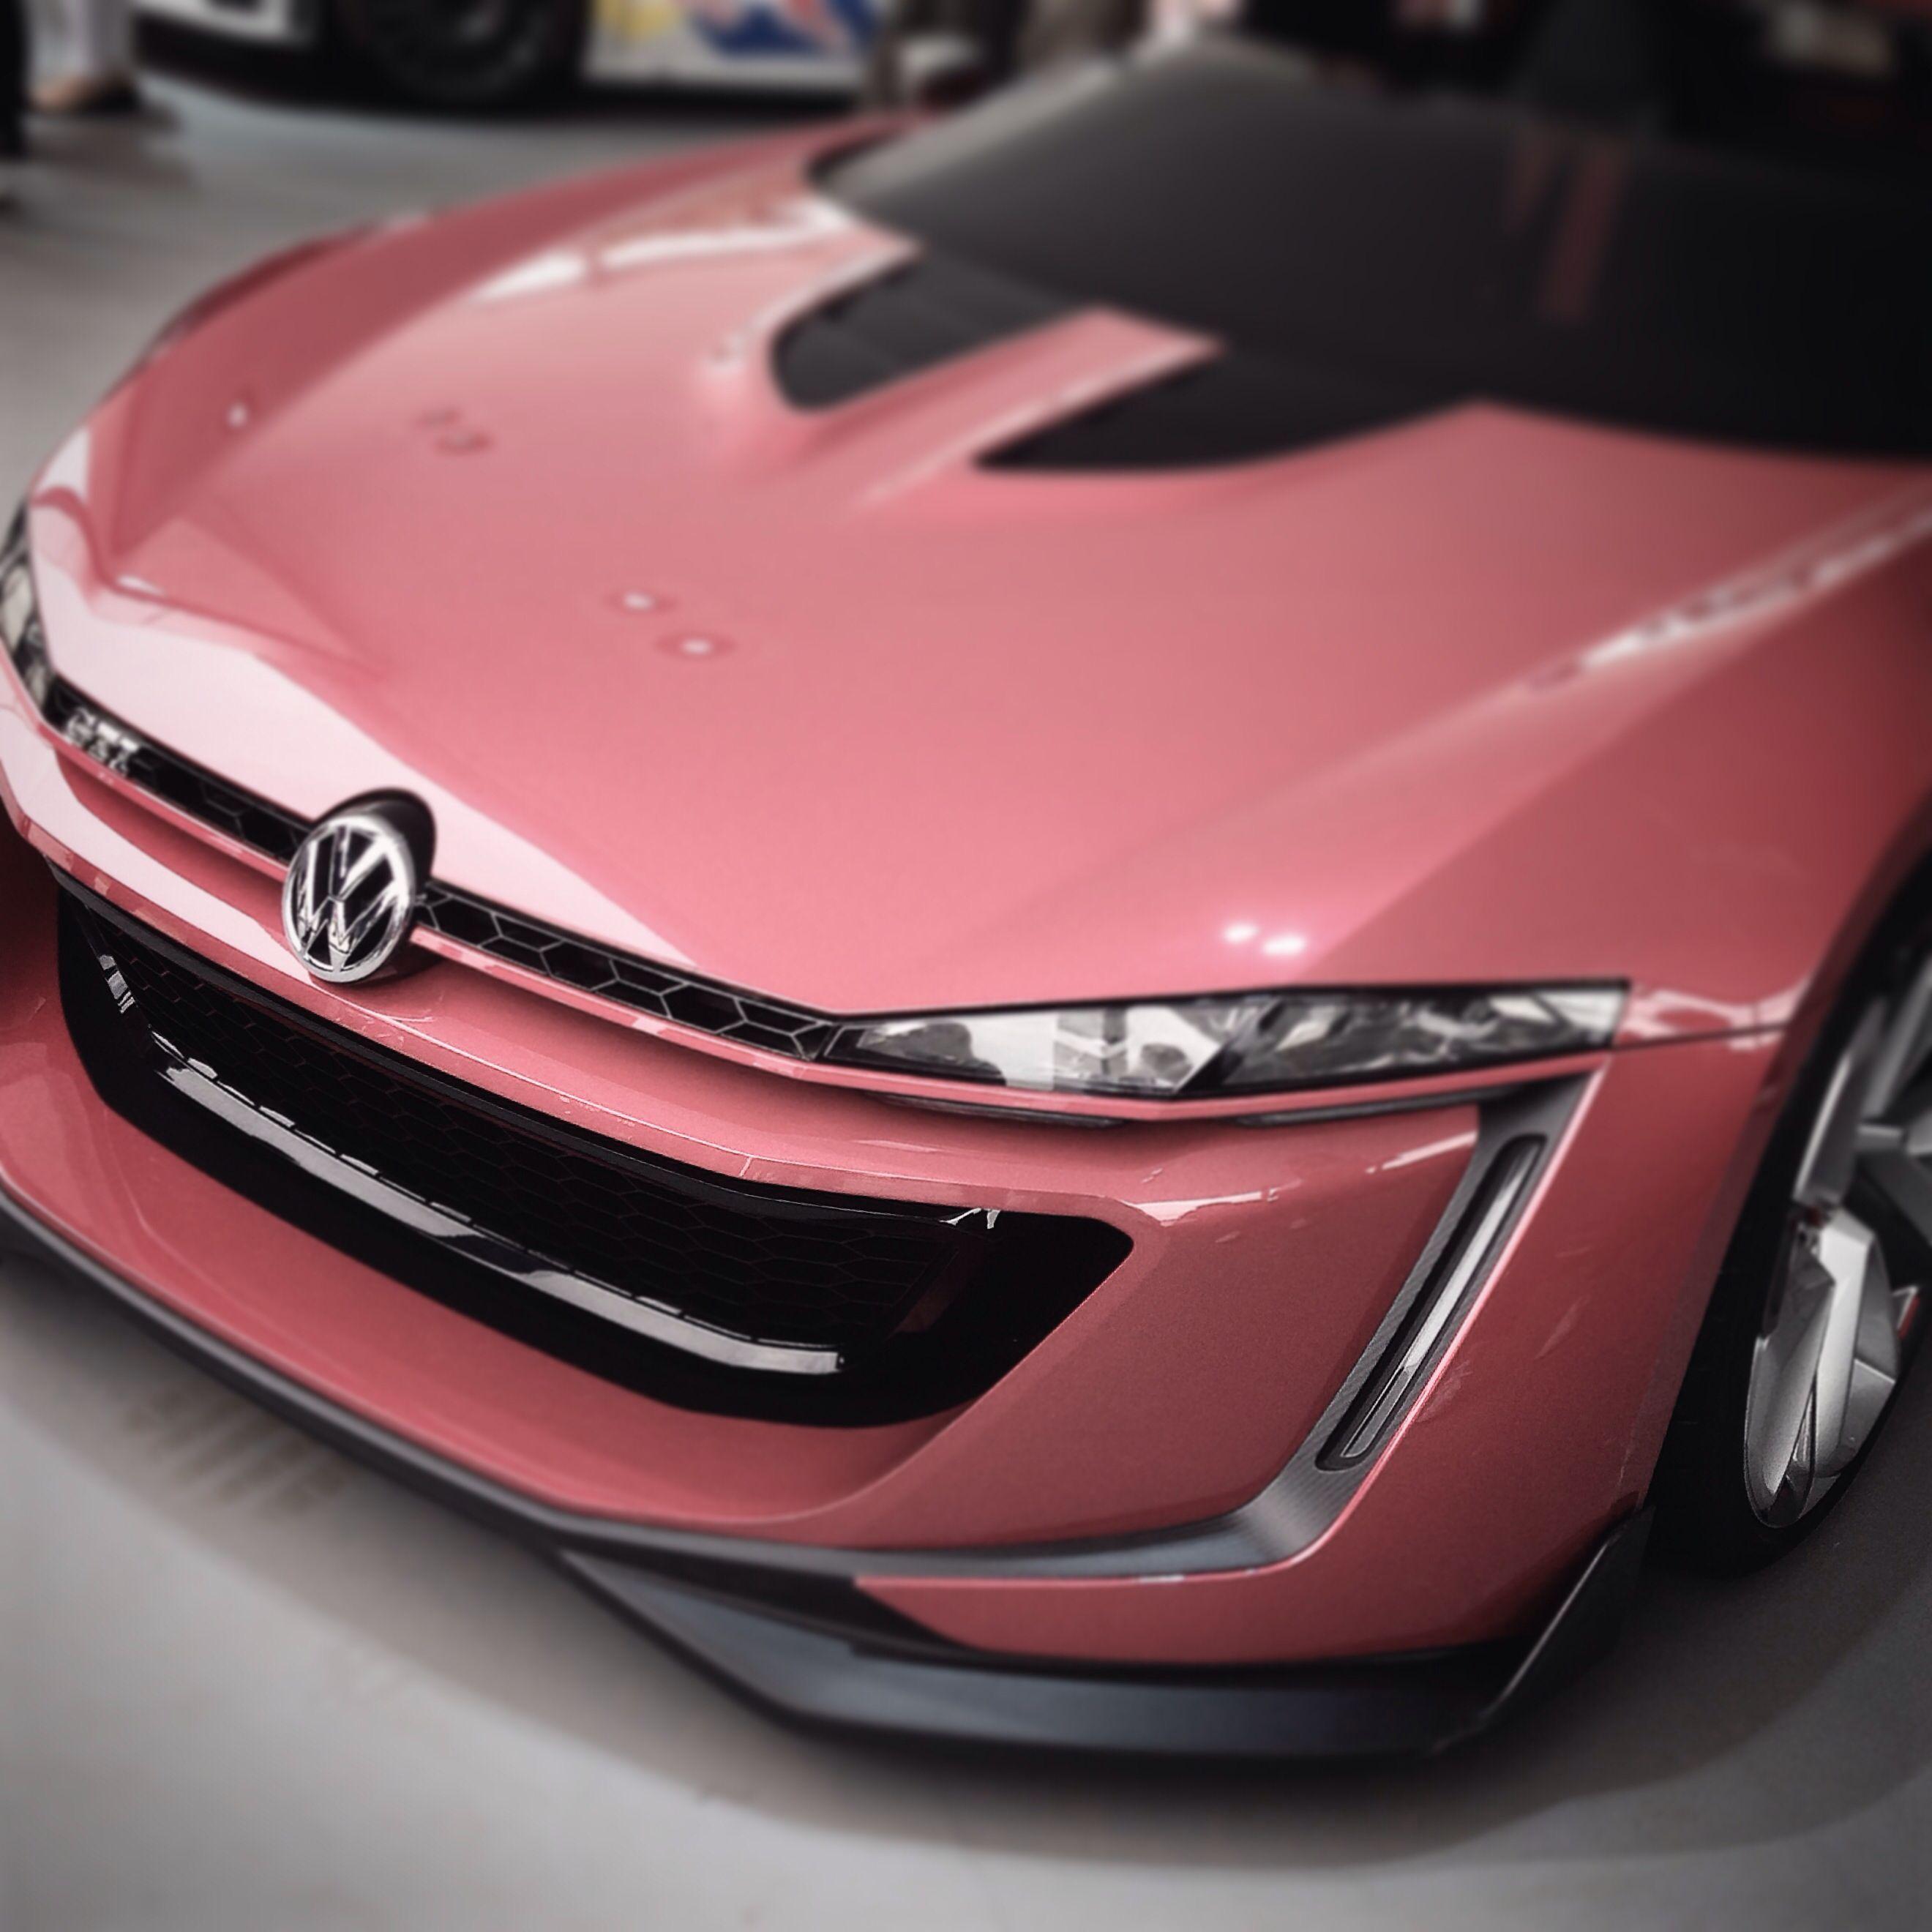 VW GTI Roadster Concept G I R L Y • G I R L Pinterest